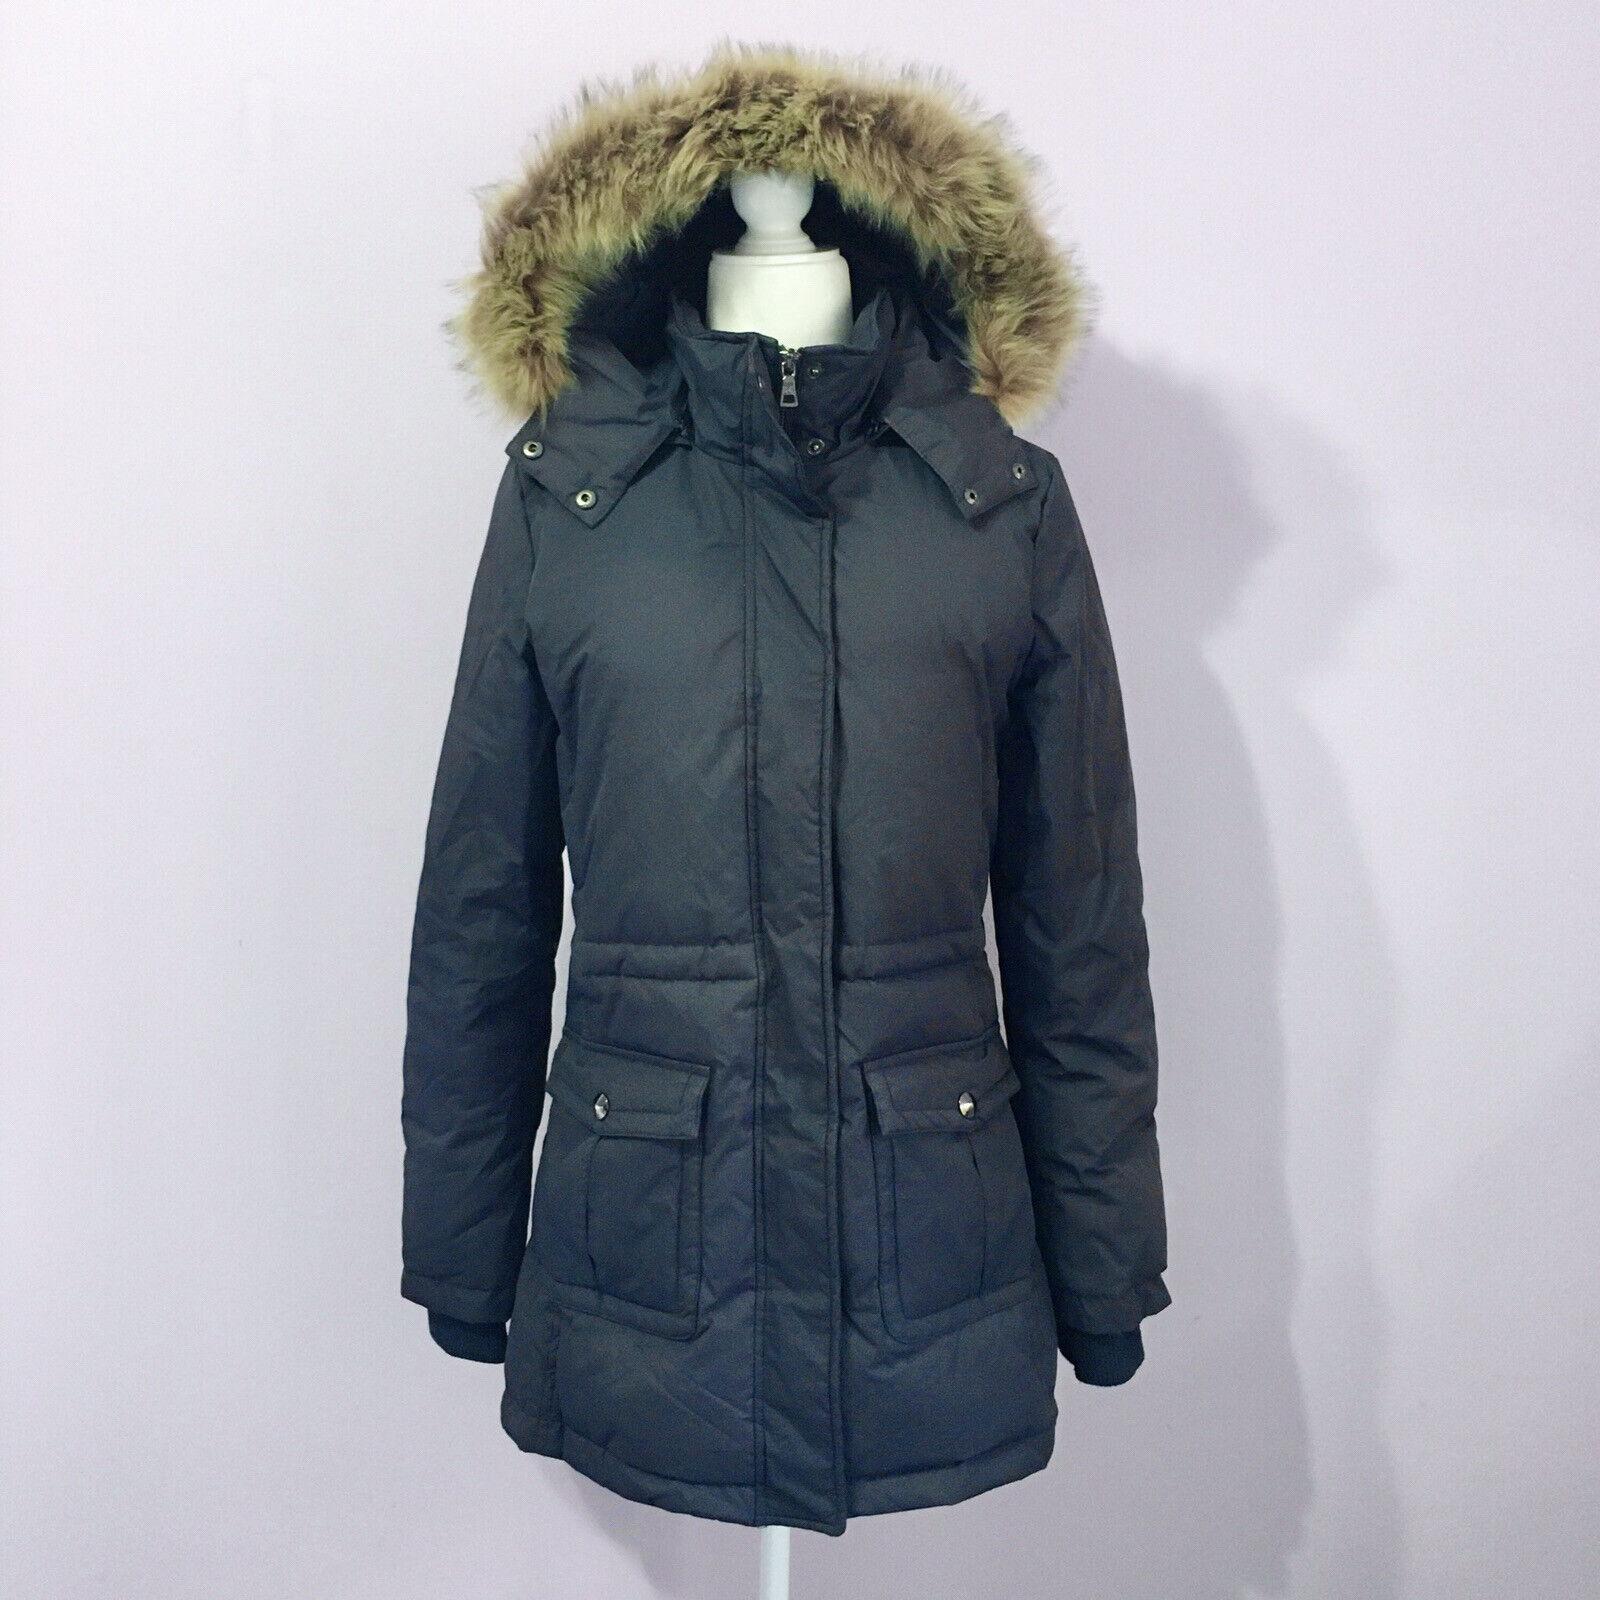 Barneys New York Size Small Navy Puffer Down Parka Jacket Coat Fox Fur Trim Hood